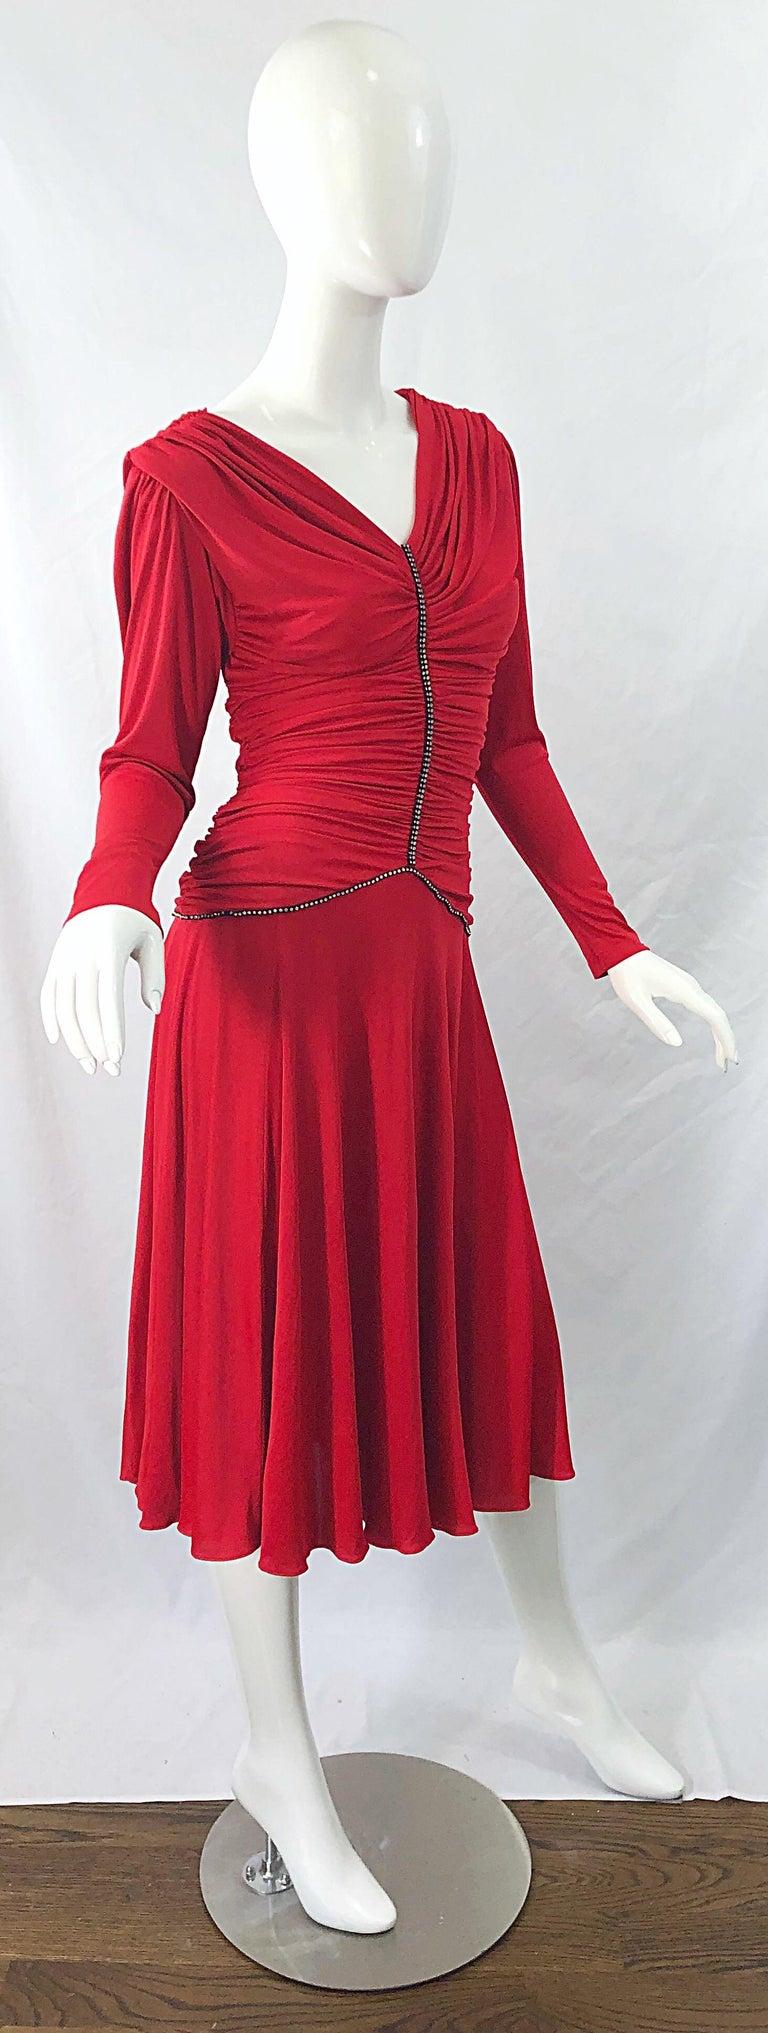 1970s Claraluna Original Lipstick Red Rhinestone Slinky Jersey Vintage 70s Dress For Sale 7